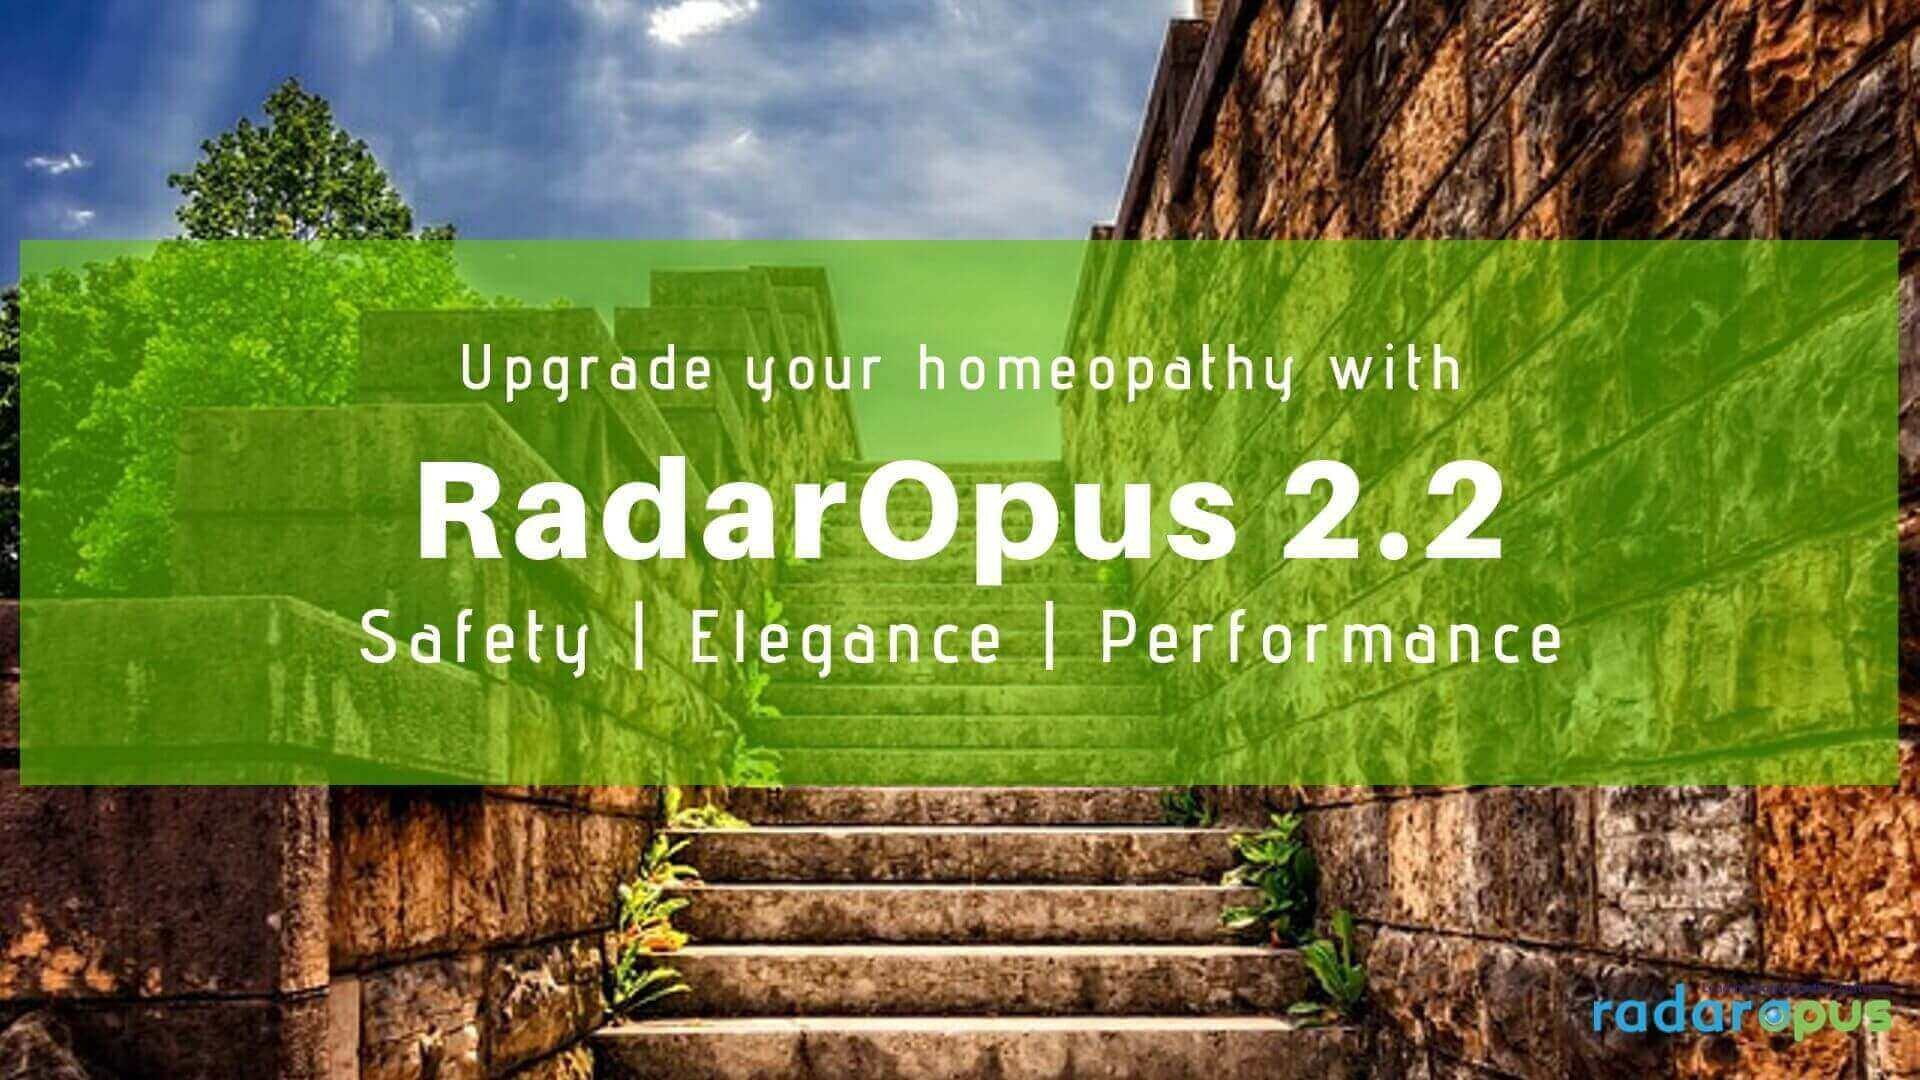 radaropus 2.2 update